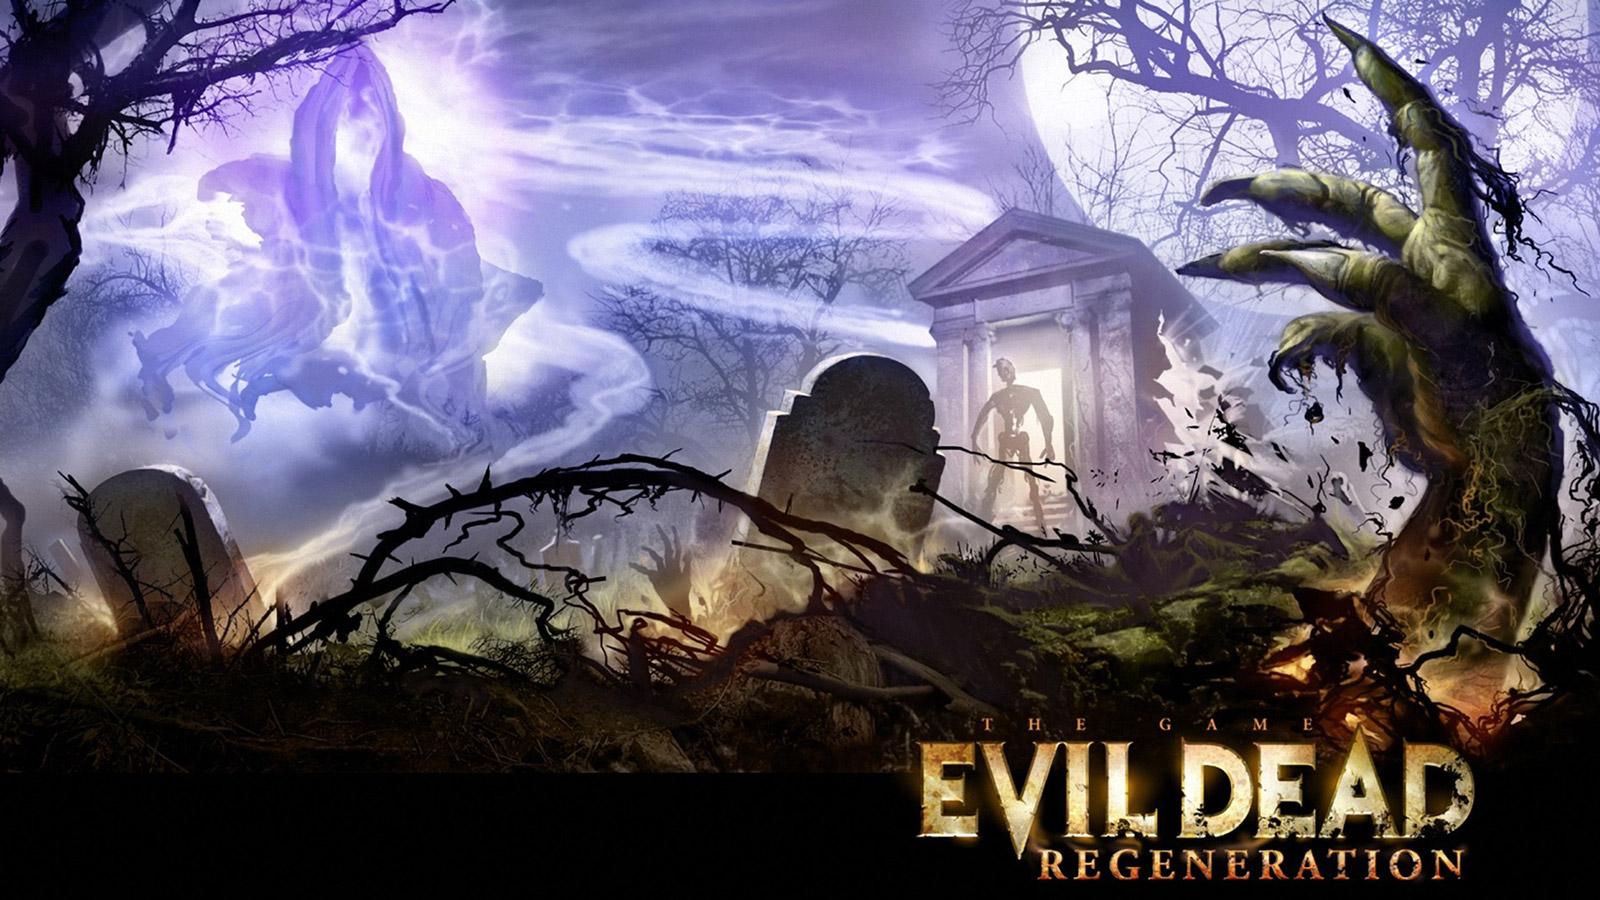 Evil Dead: Regeneration Wallpaper in 1600x900